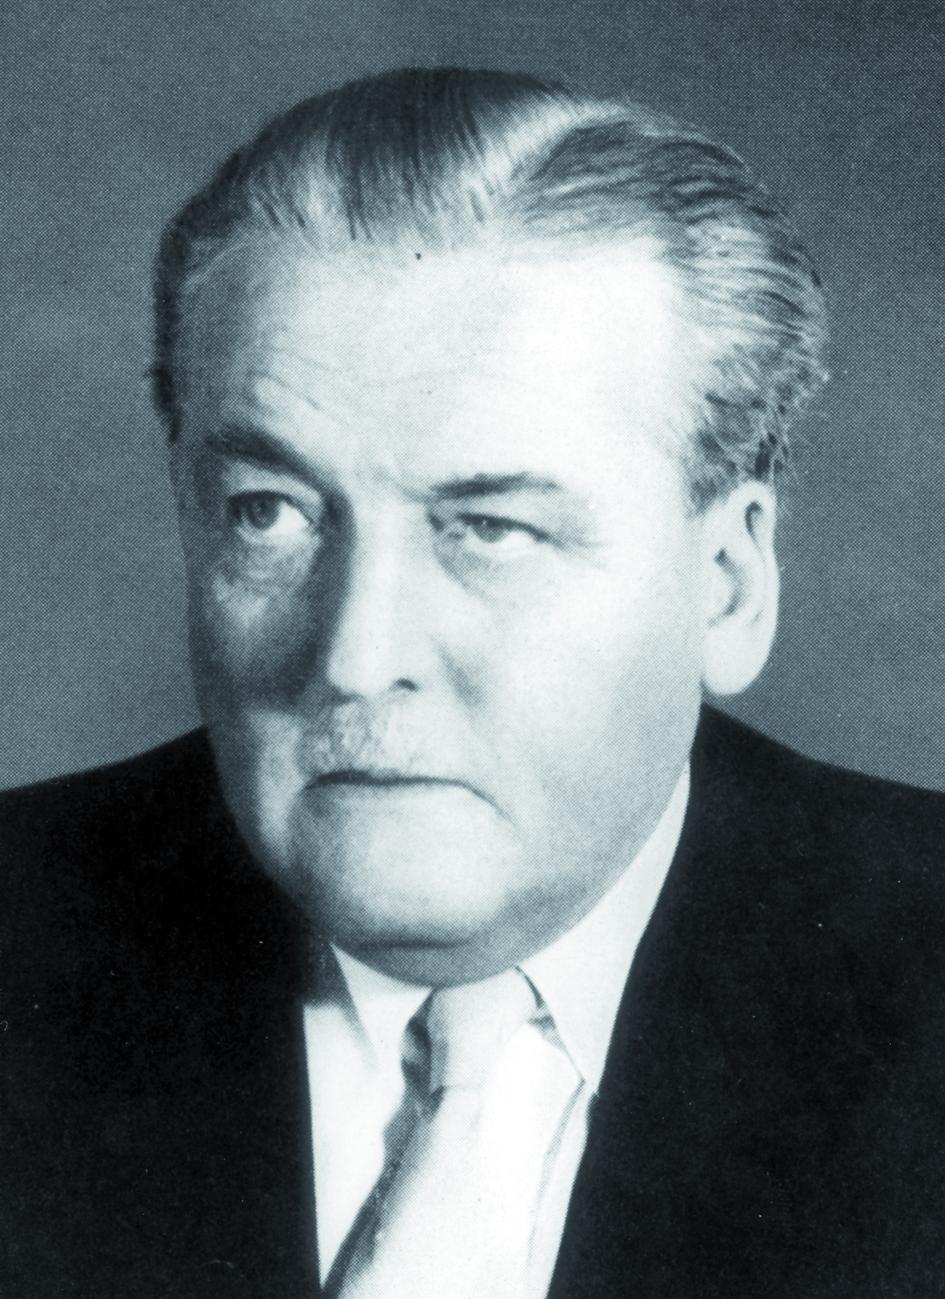 Portraitfoto von Herrn Boris Rajewski.